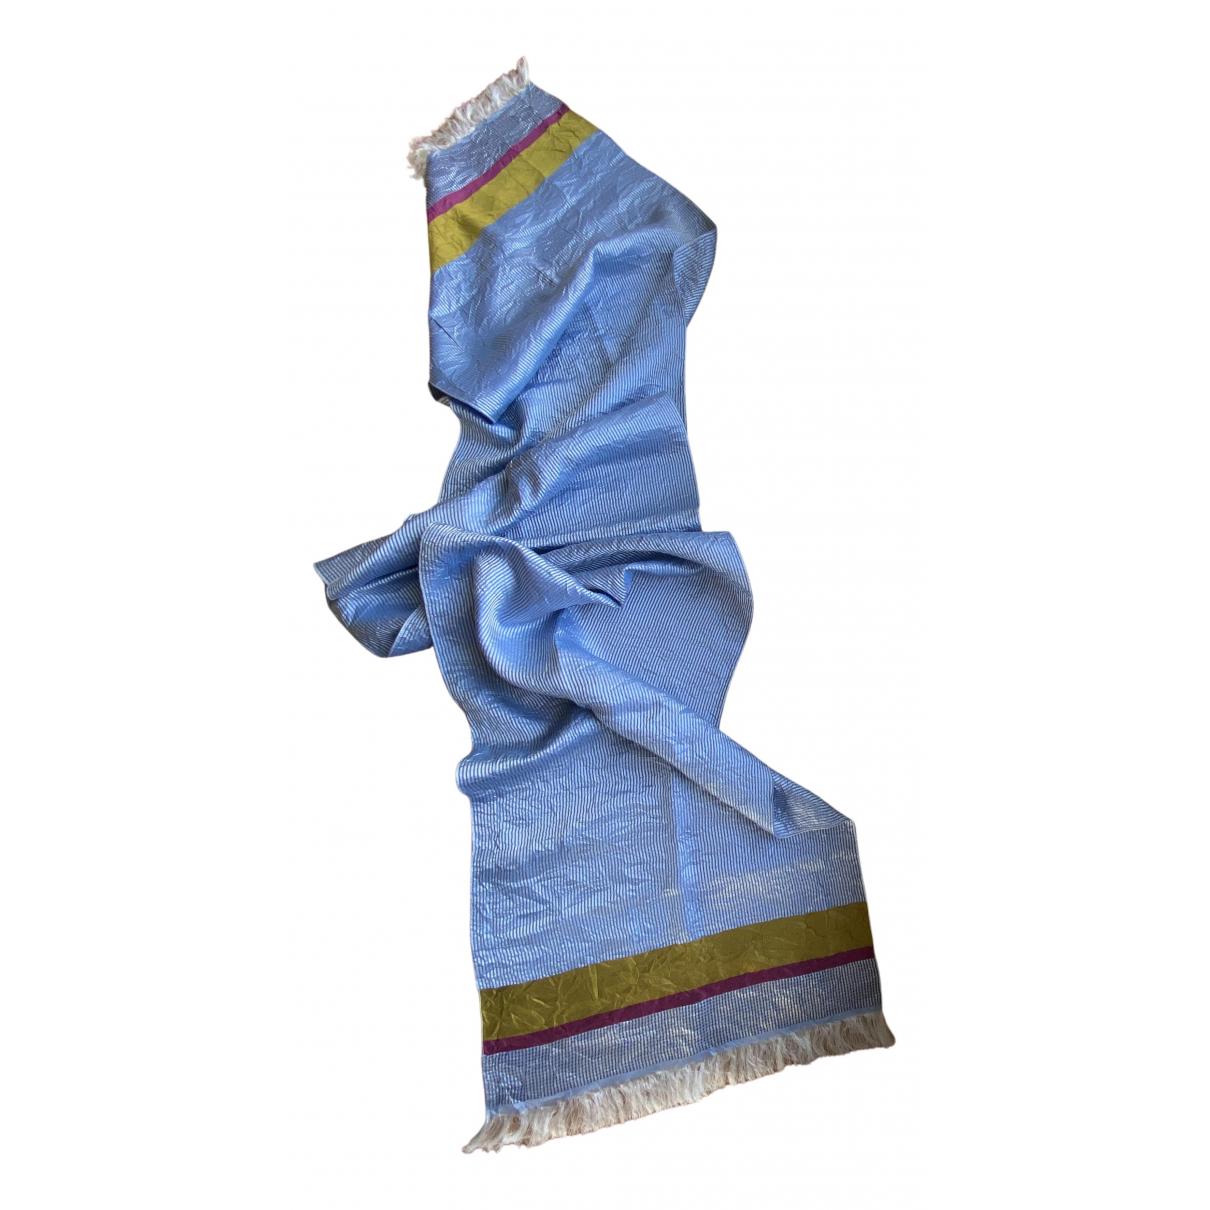 Kenzo N Blue Silk scarf & pocket squares for Men N